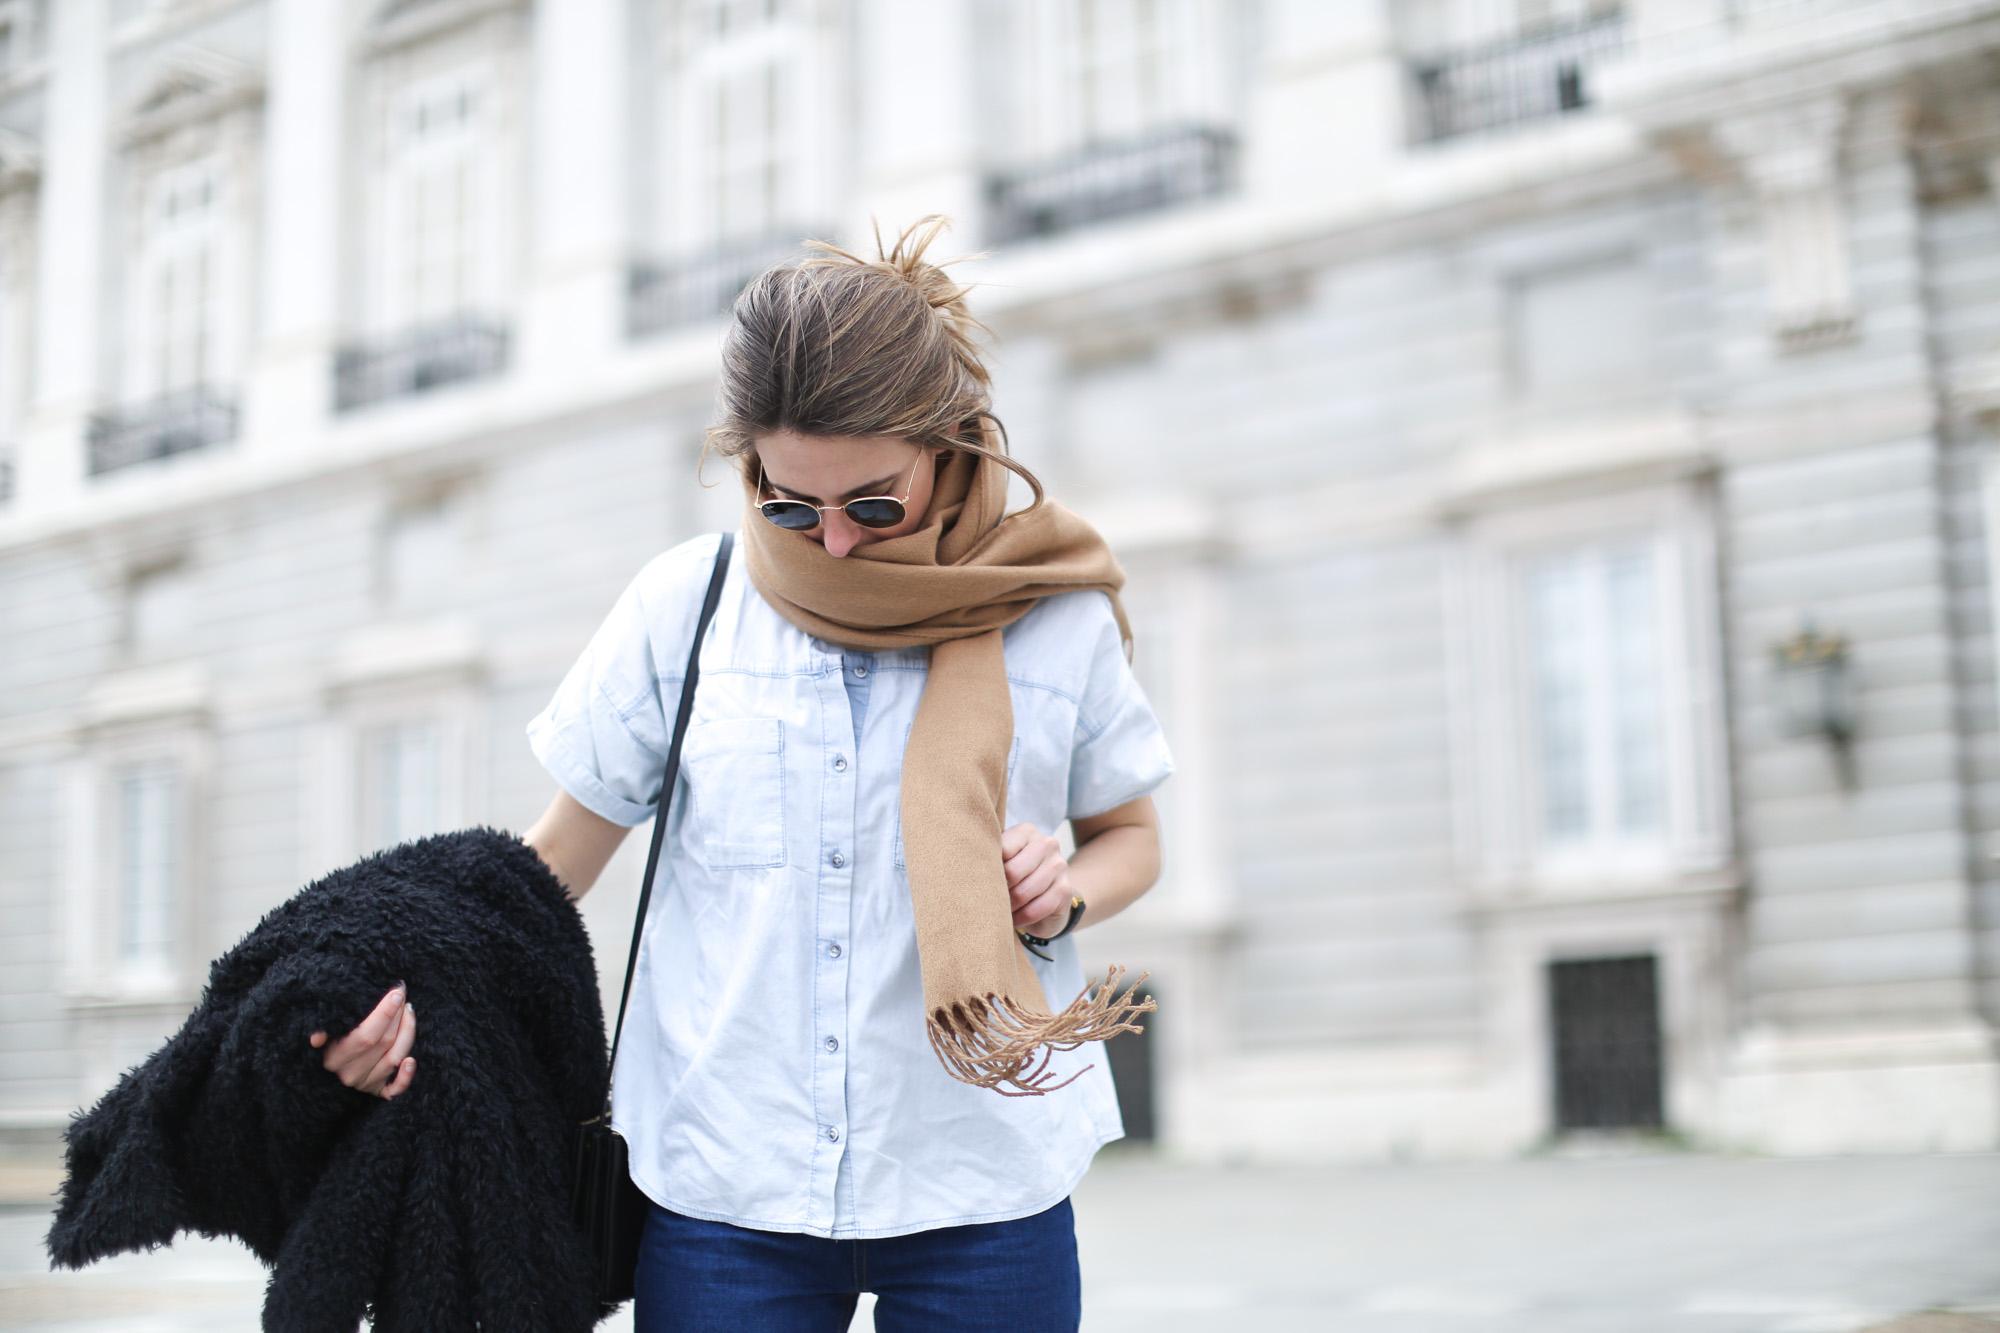 Clochet-mango-flurry-coat-mum-jeans-adidas-gazelle-7